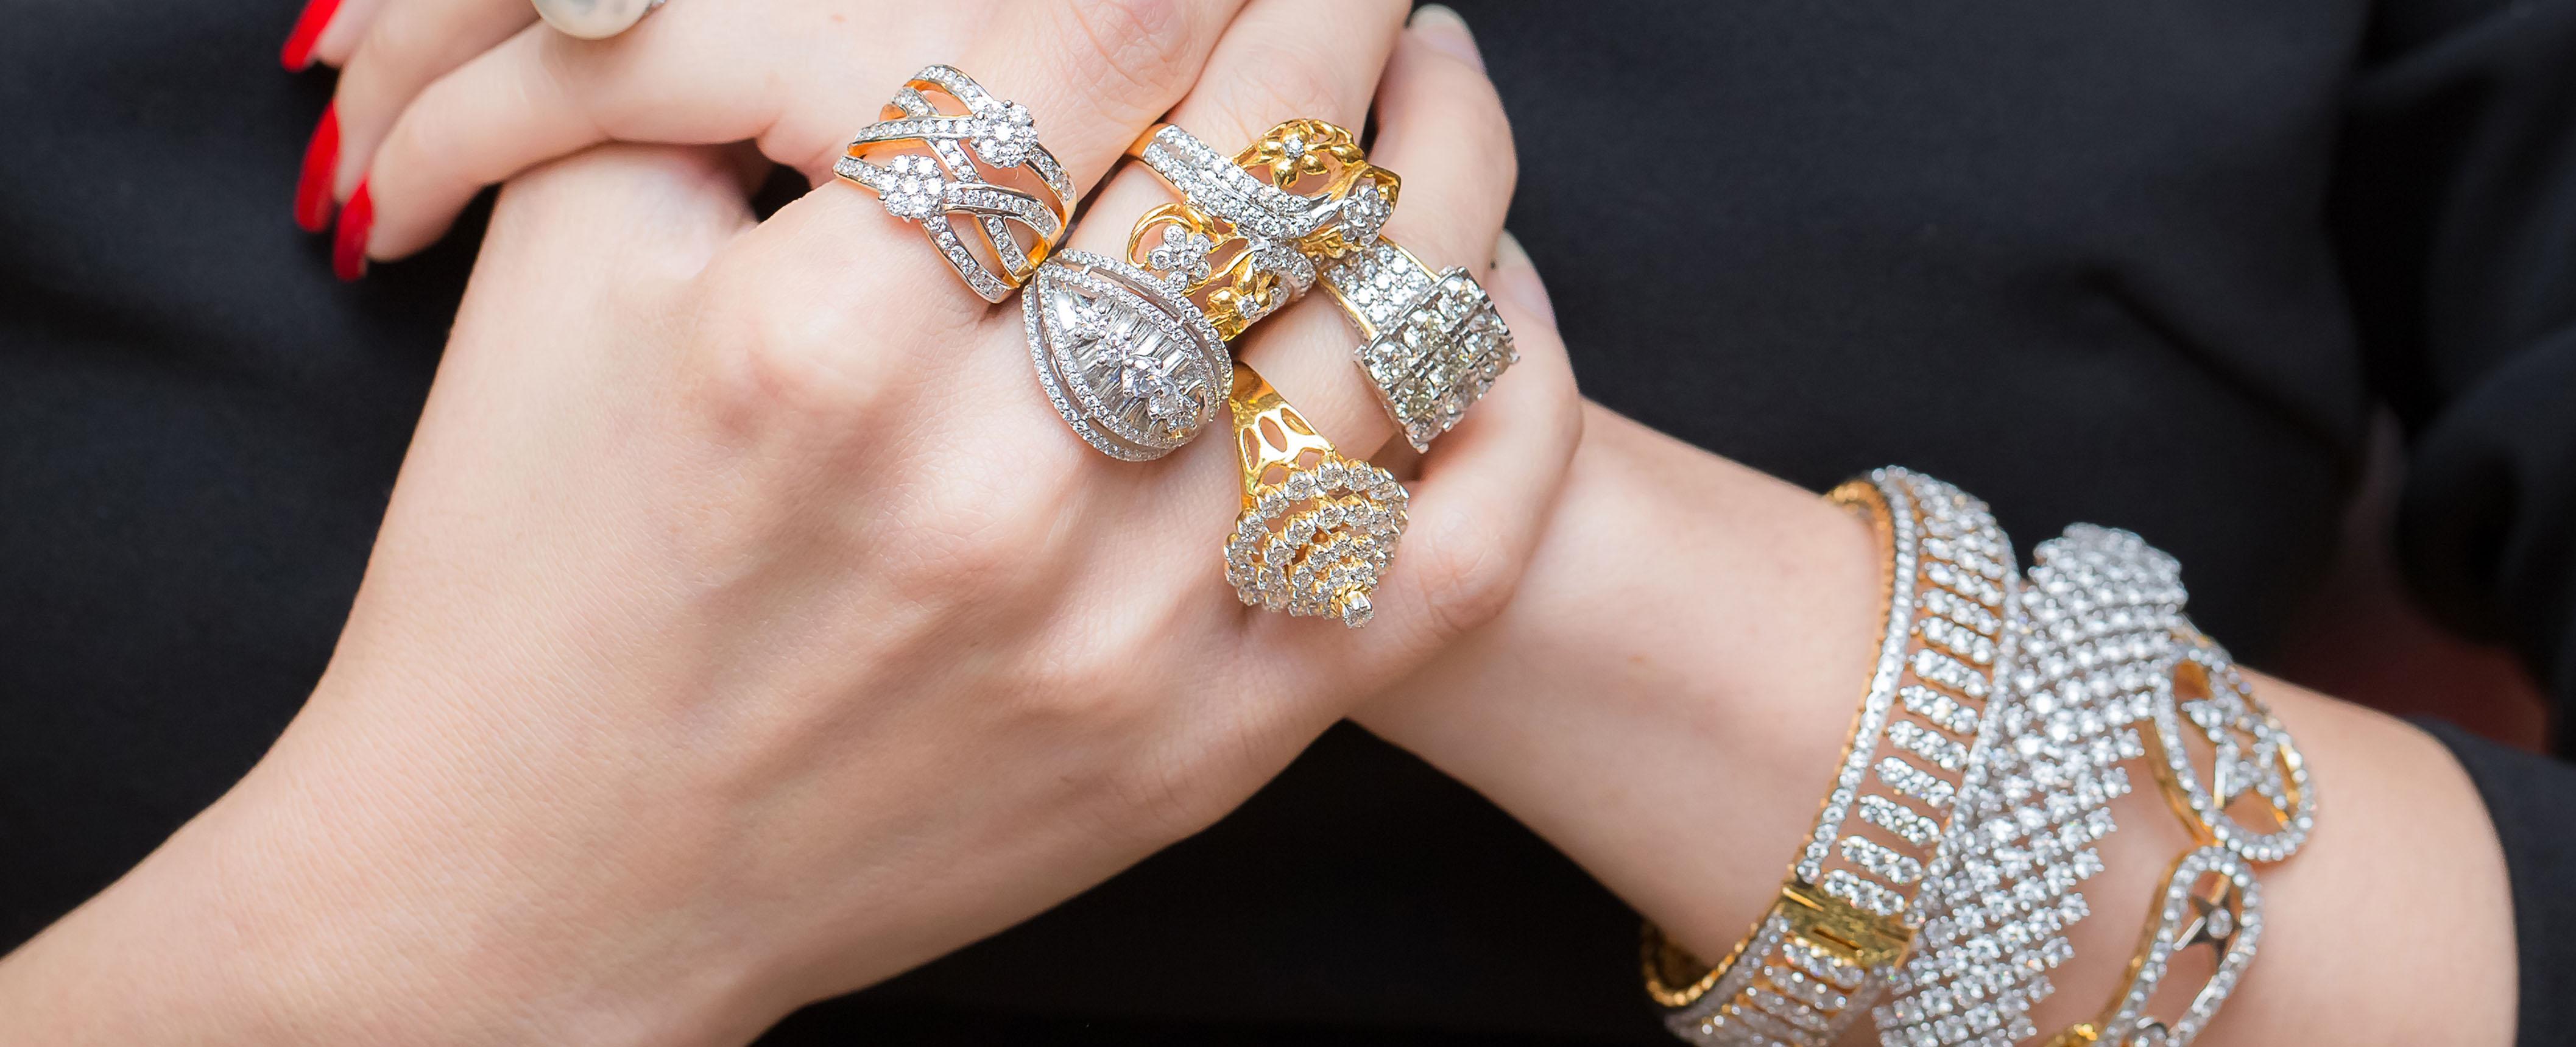 Taxatiedag juwelen & edelstenen